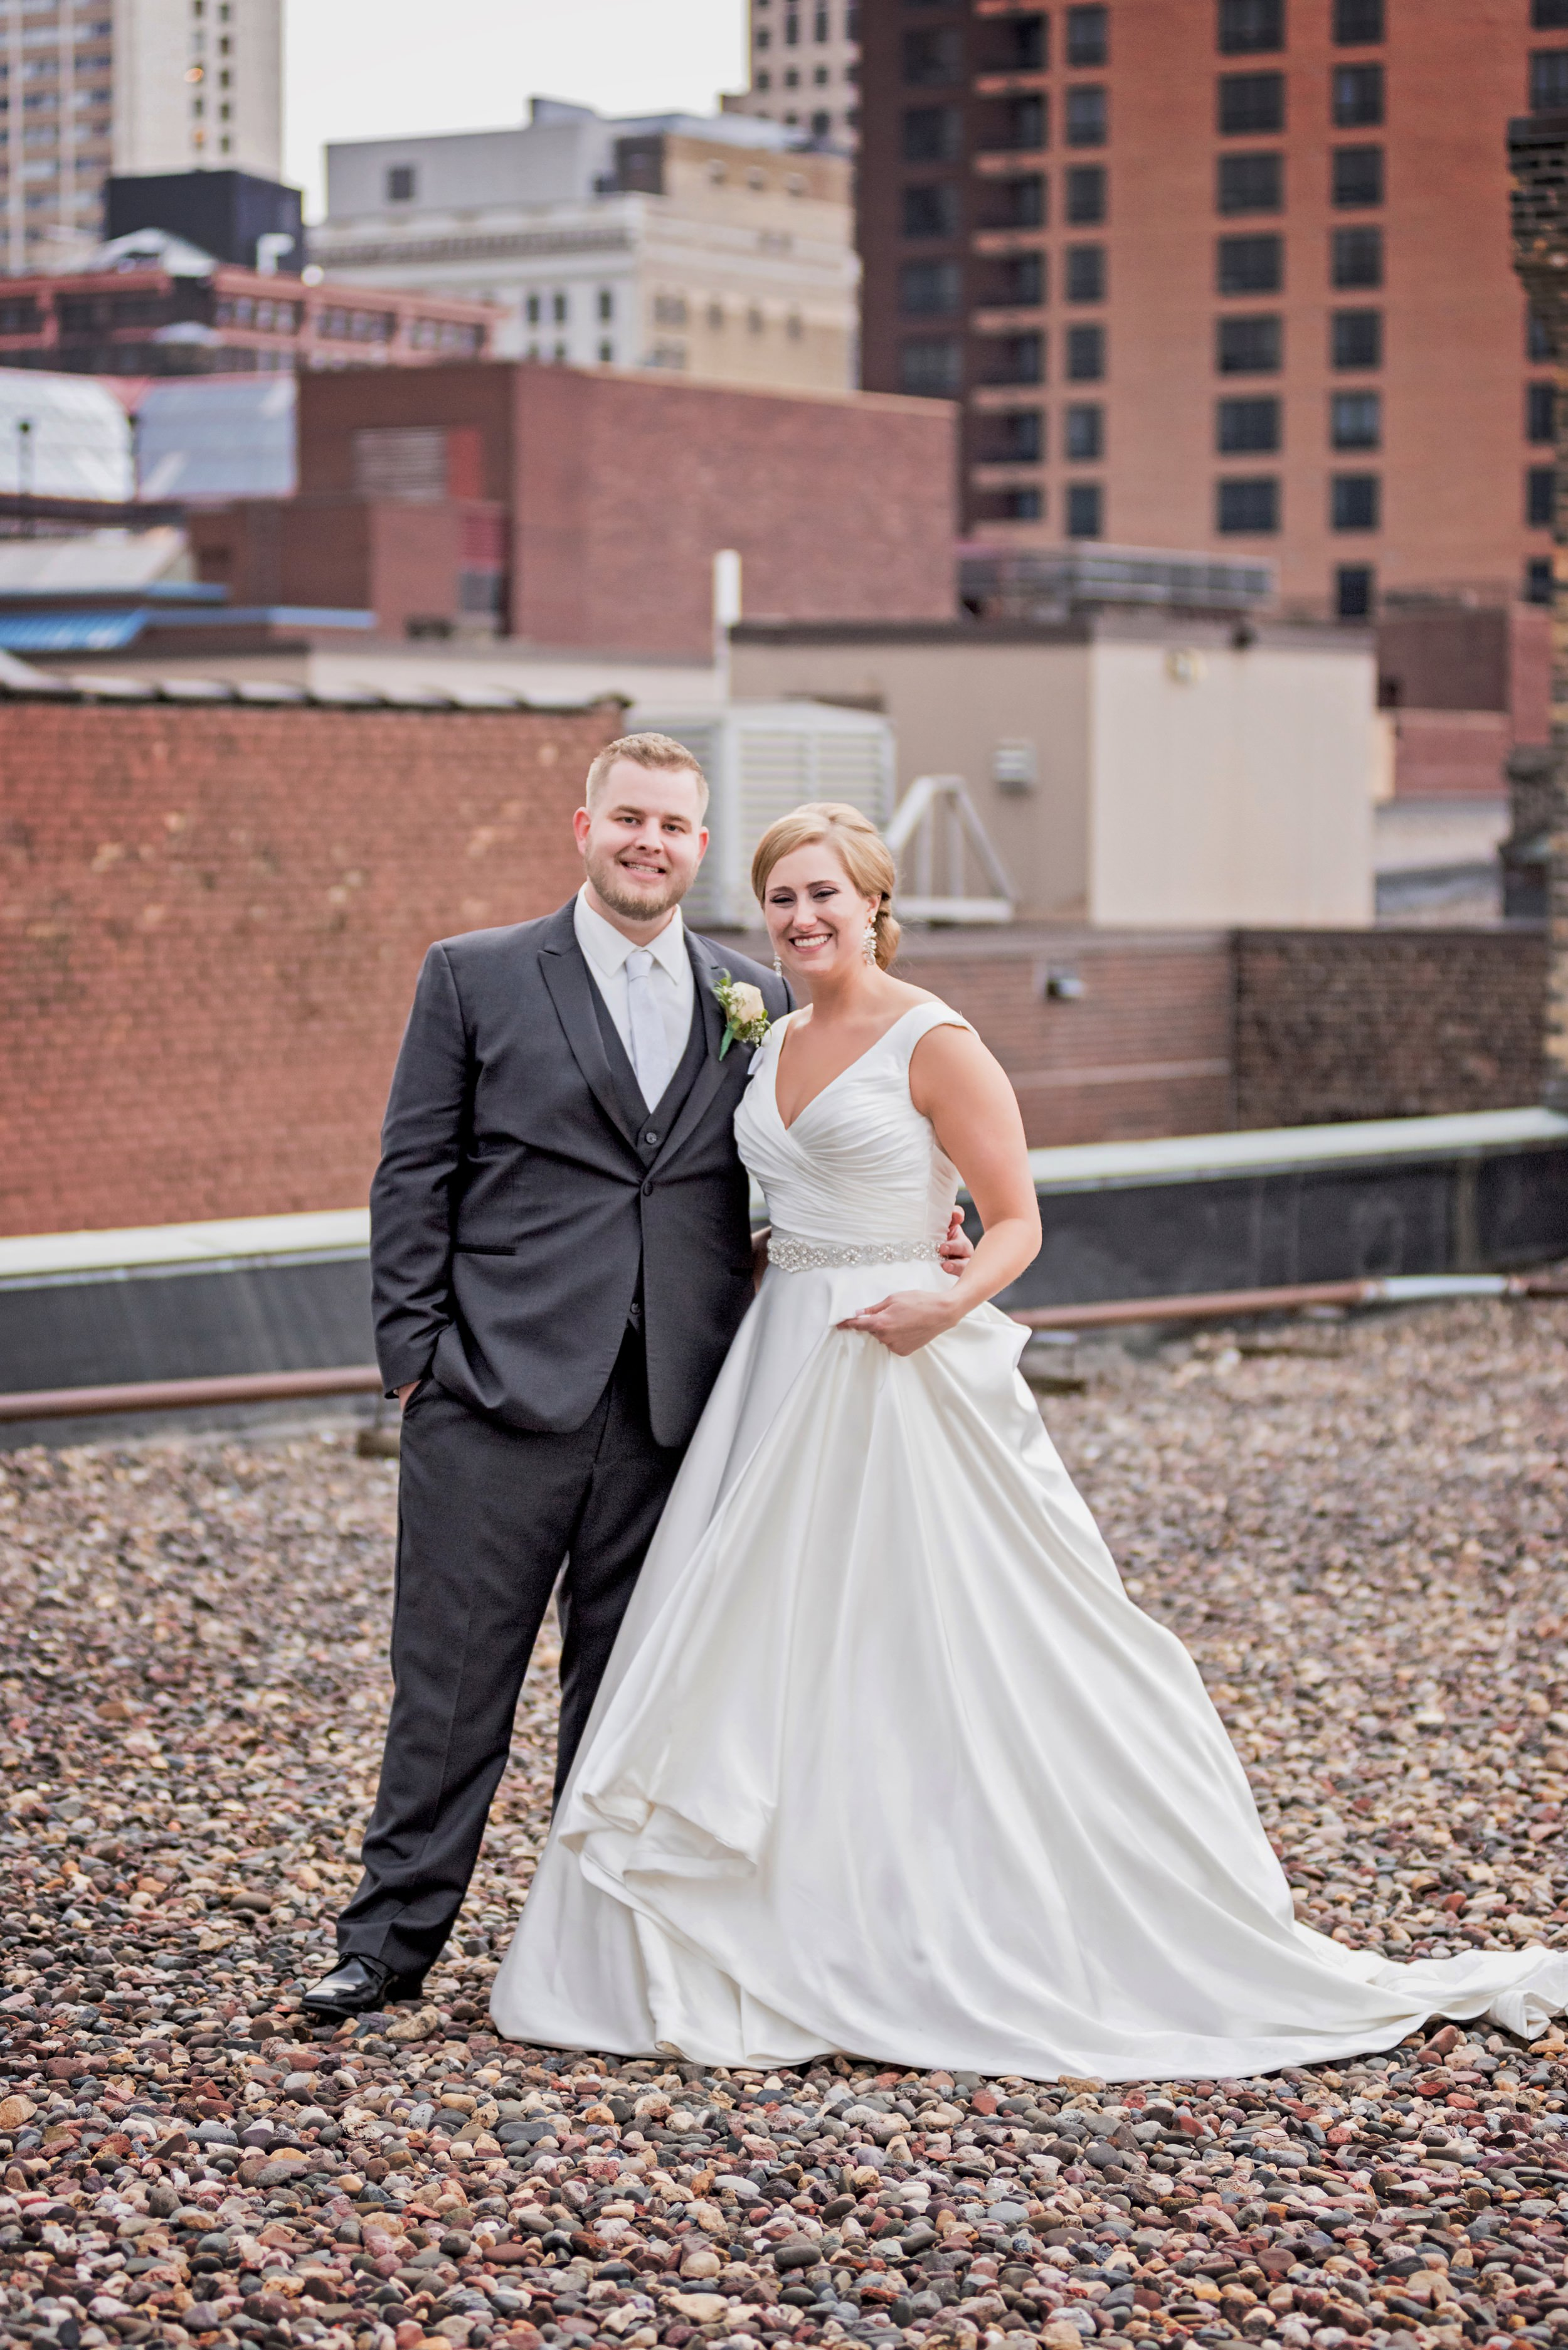 2018-Real-Wedding-Megan-Brenden-Rotella-Photography_0421.jpg